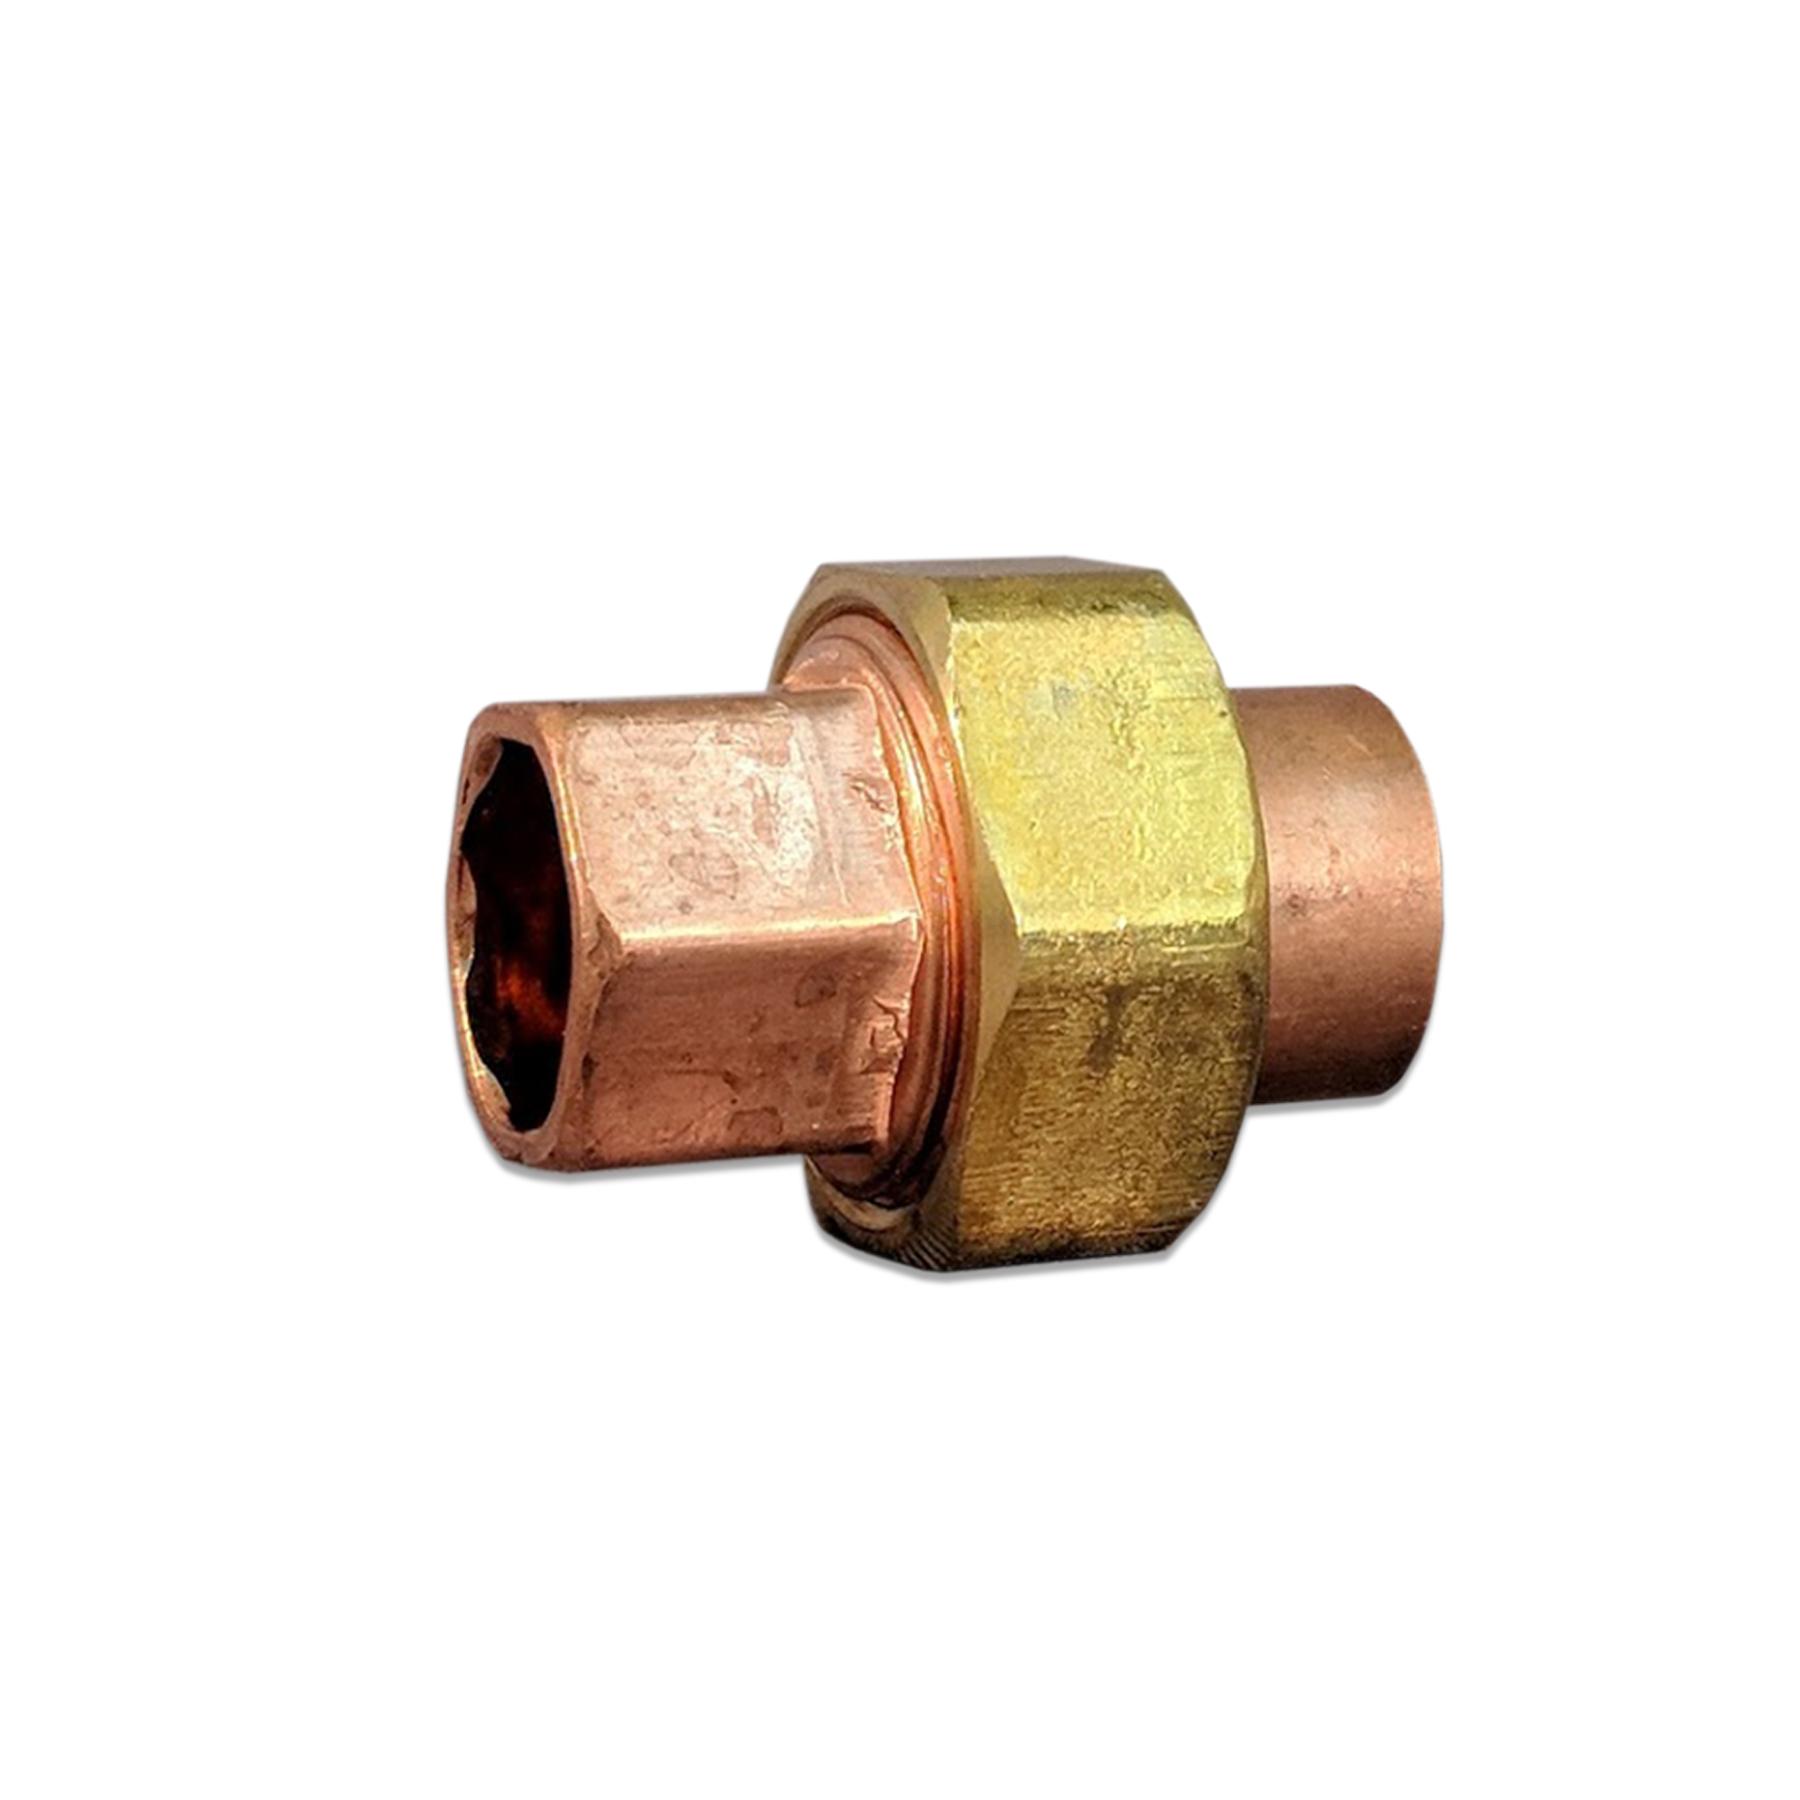 Copper Union Sweat Fitting, 1/2 x 1/2 (F)